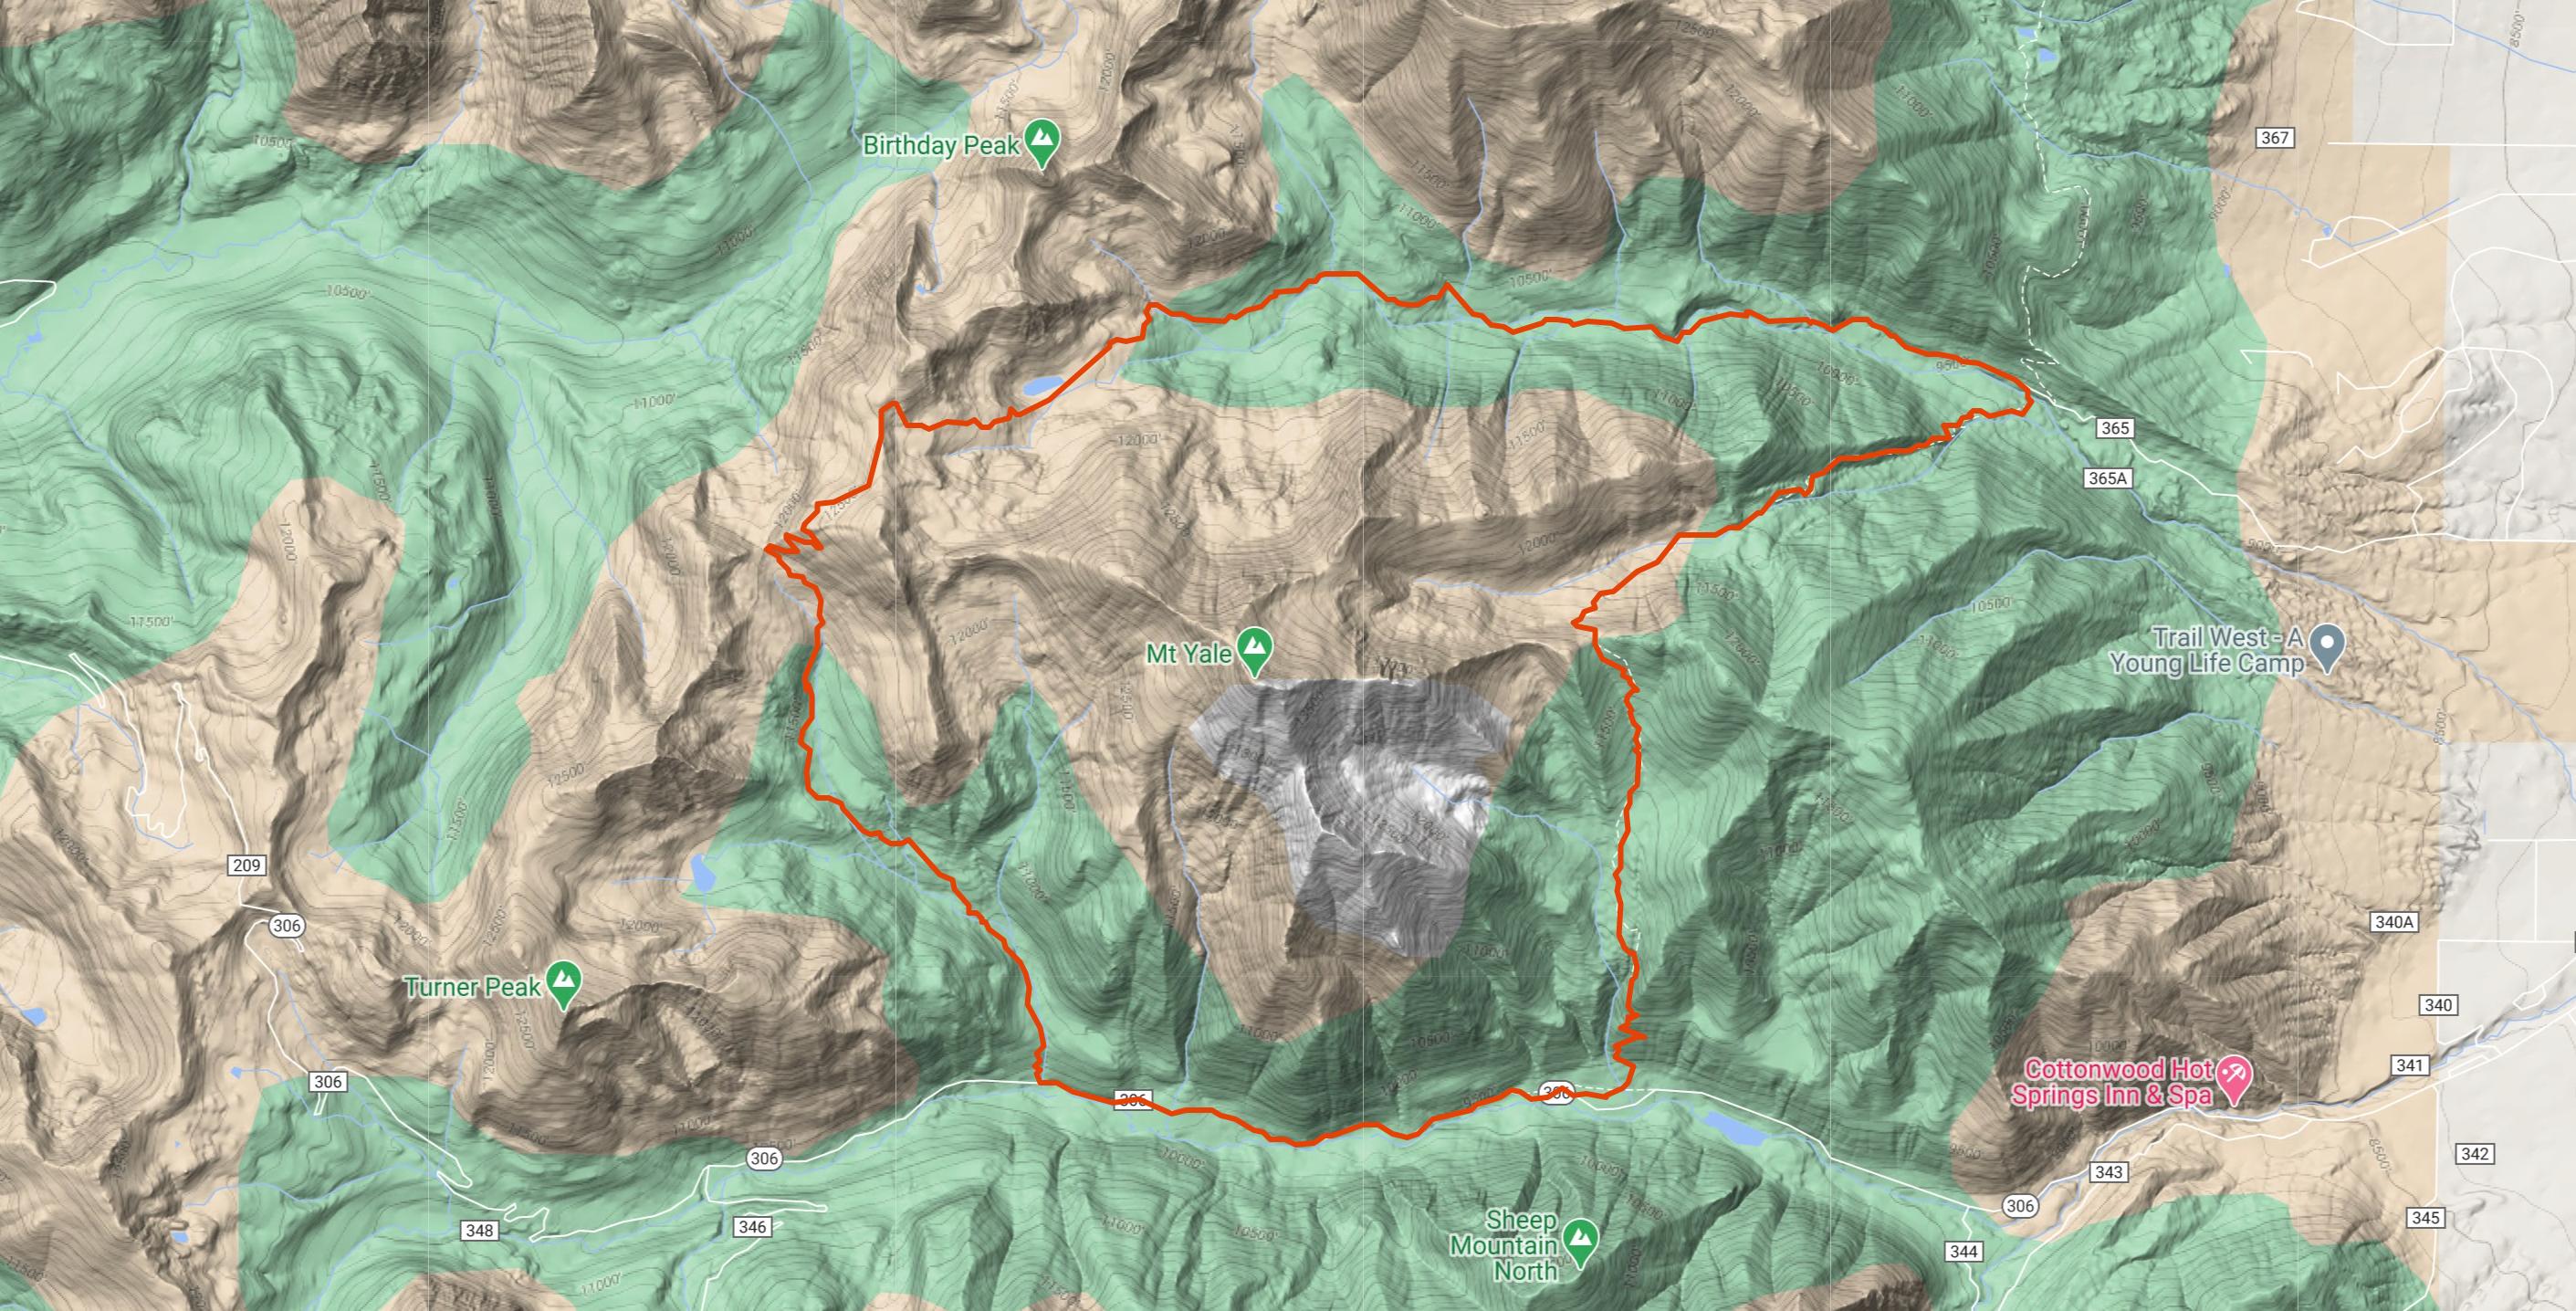 Yale 360 - Trail Running Circumnavigating Mt. Yale